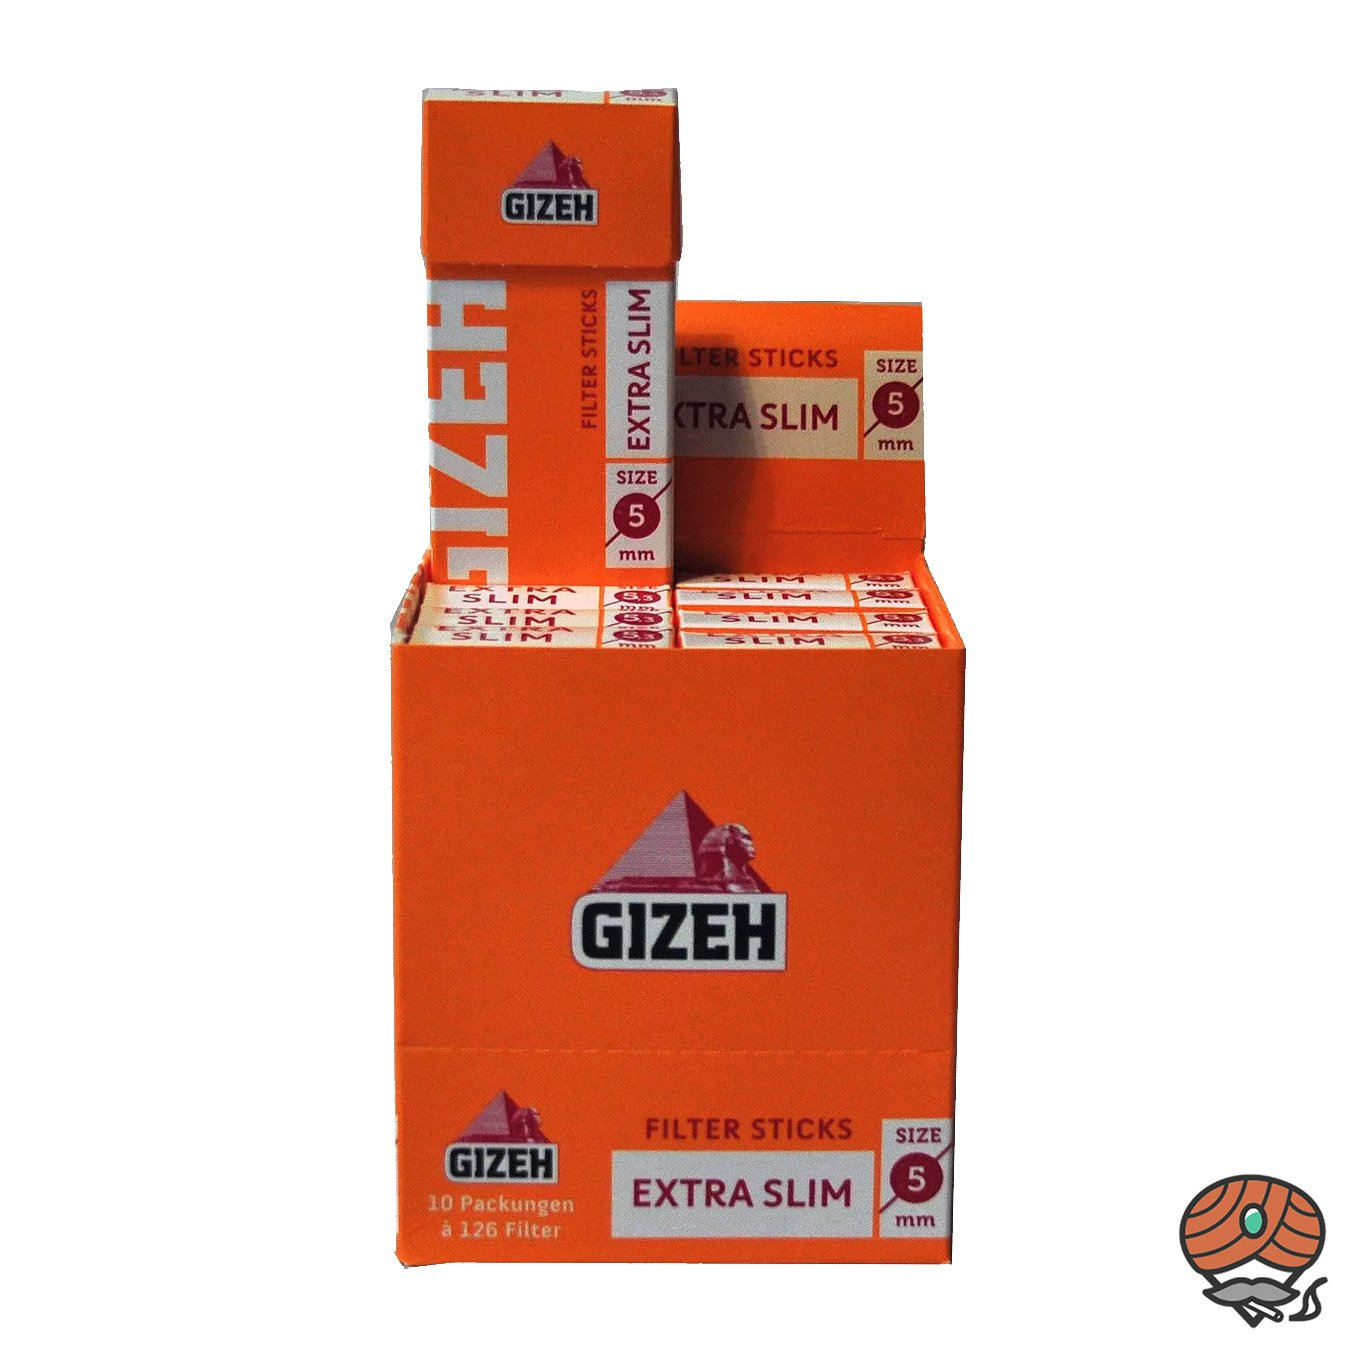 Gizeh Filter Sticks Extra Slim 10 Pack à 126 Filter Durchmesser 5 mm